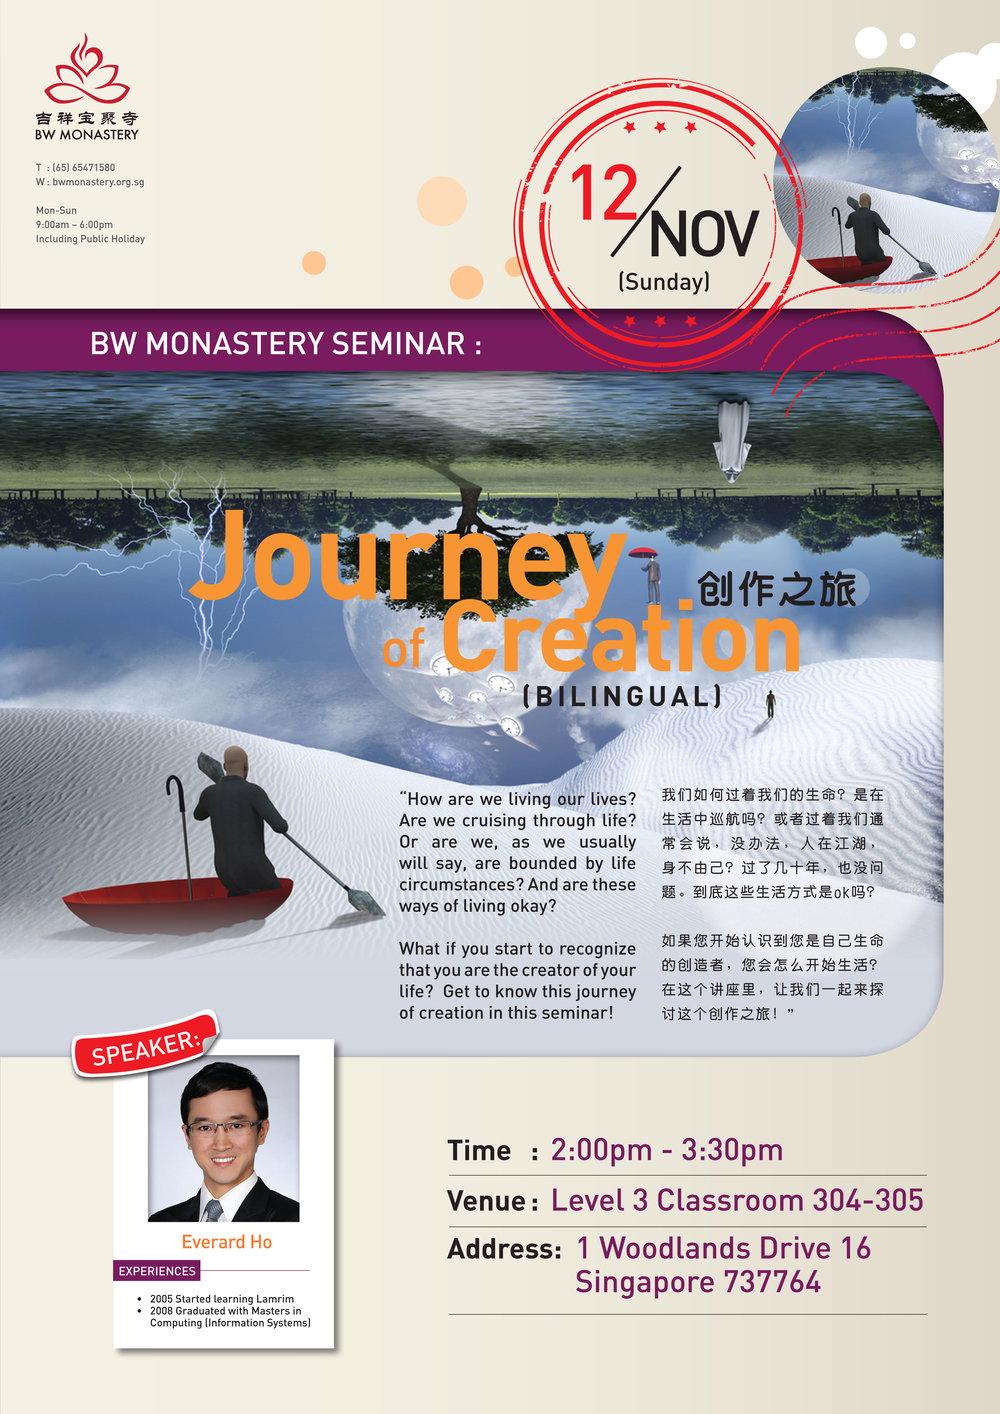 12.11.17 JOURNEY OF CREATION (2).jpg